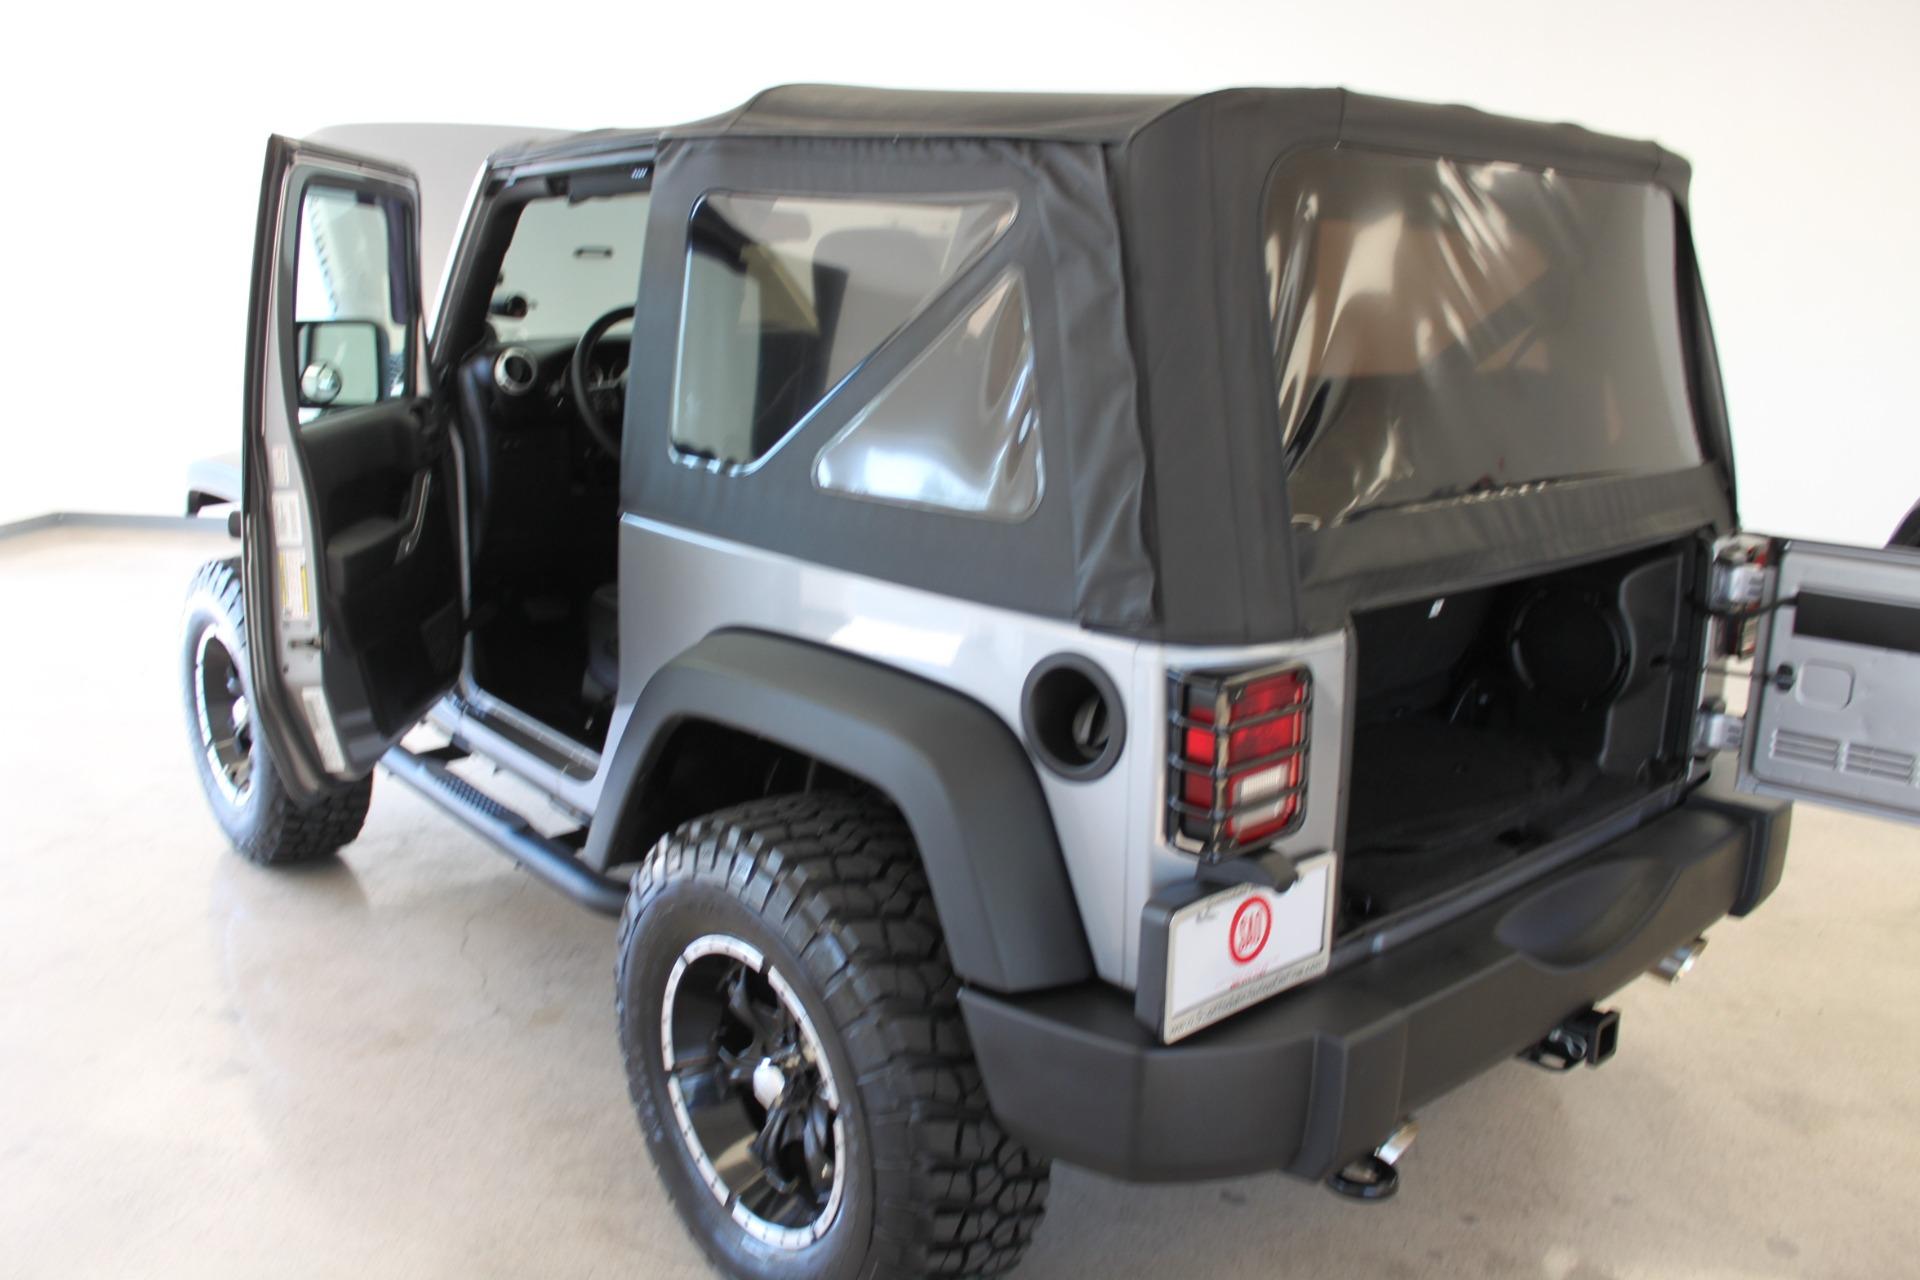 Used-2013-Jeep-Wrangler-Rubicon-LS400